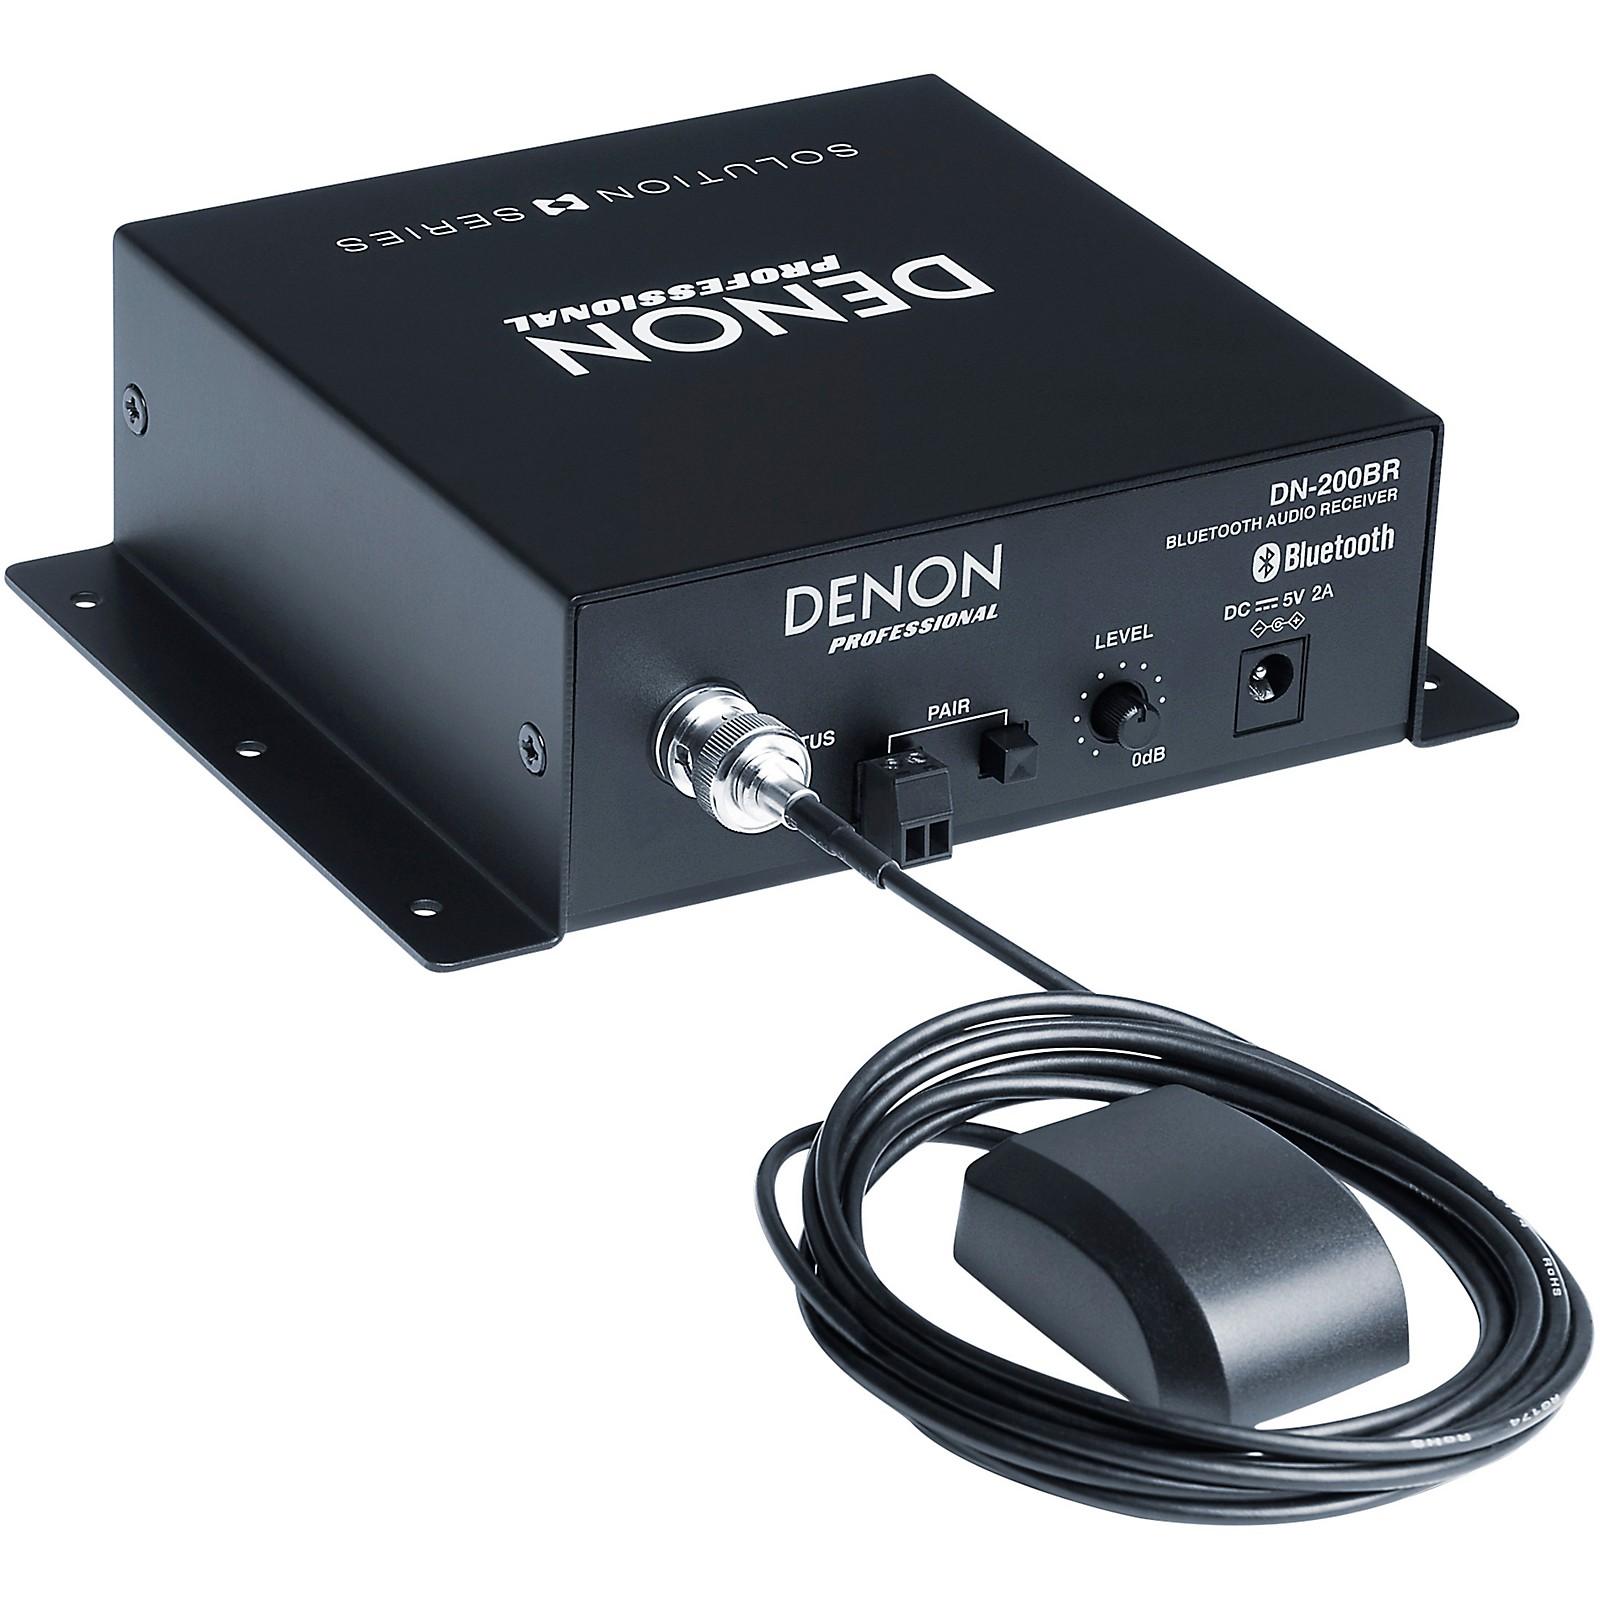 Denon Professional DN-200BR Stereo Bluetooth Audio Receiver